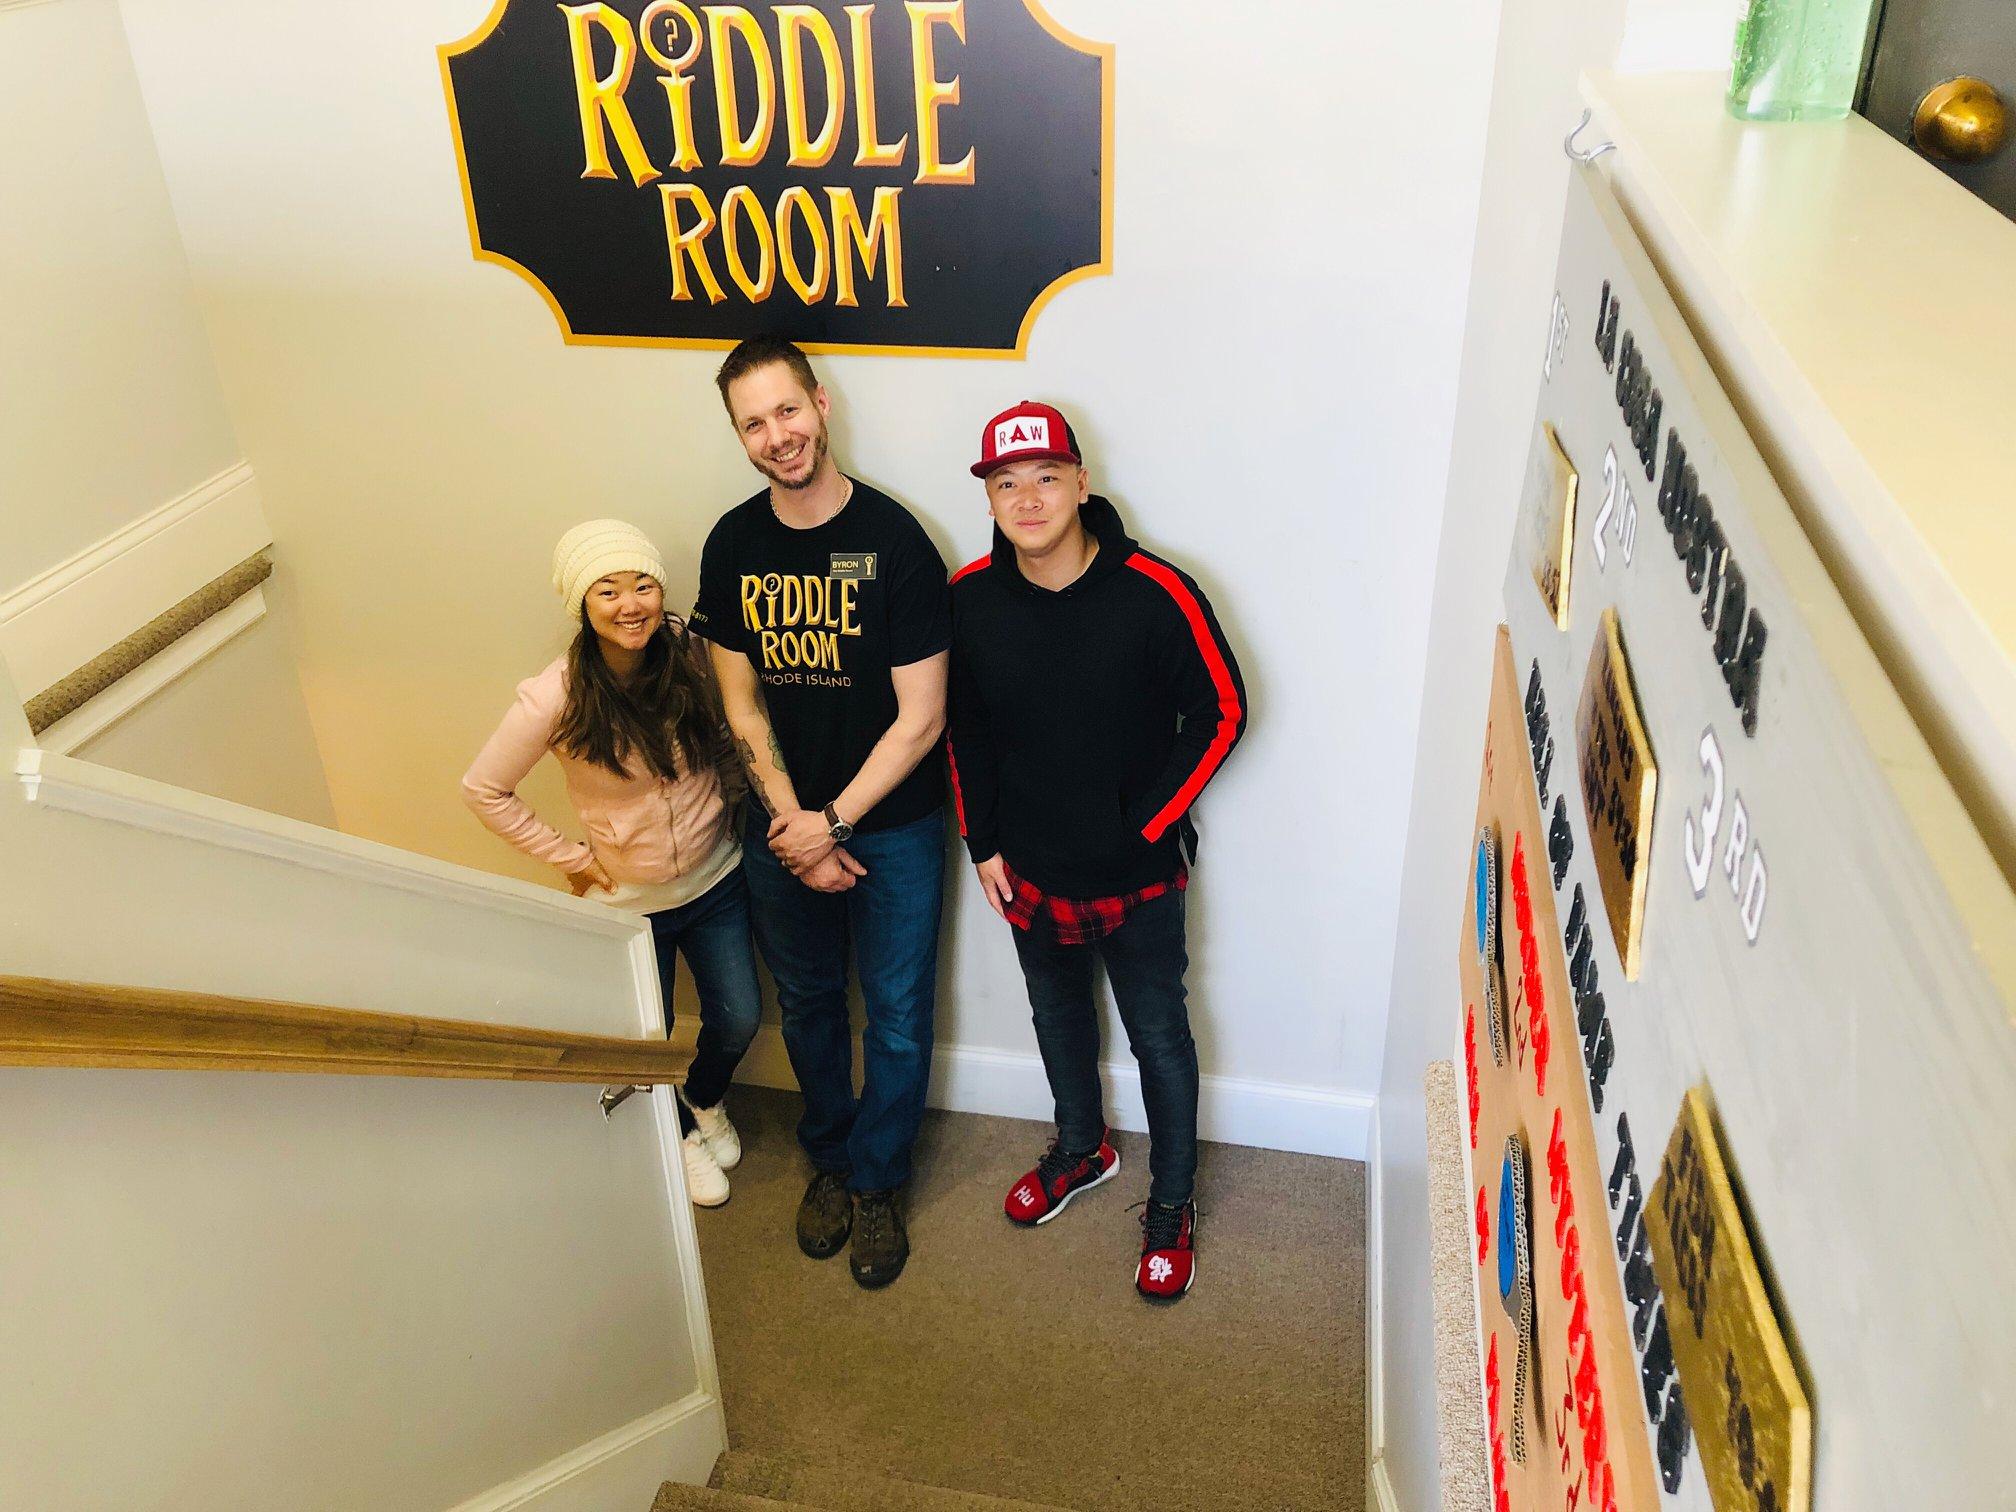 RI Riddle Room (East Greenwich)